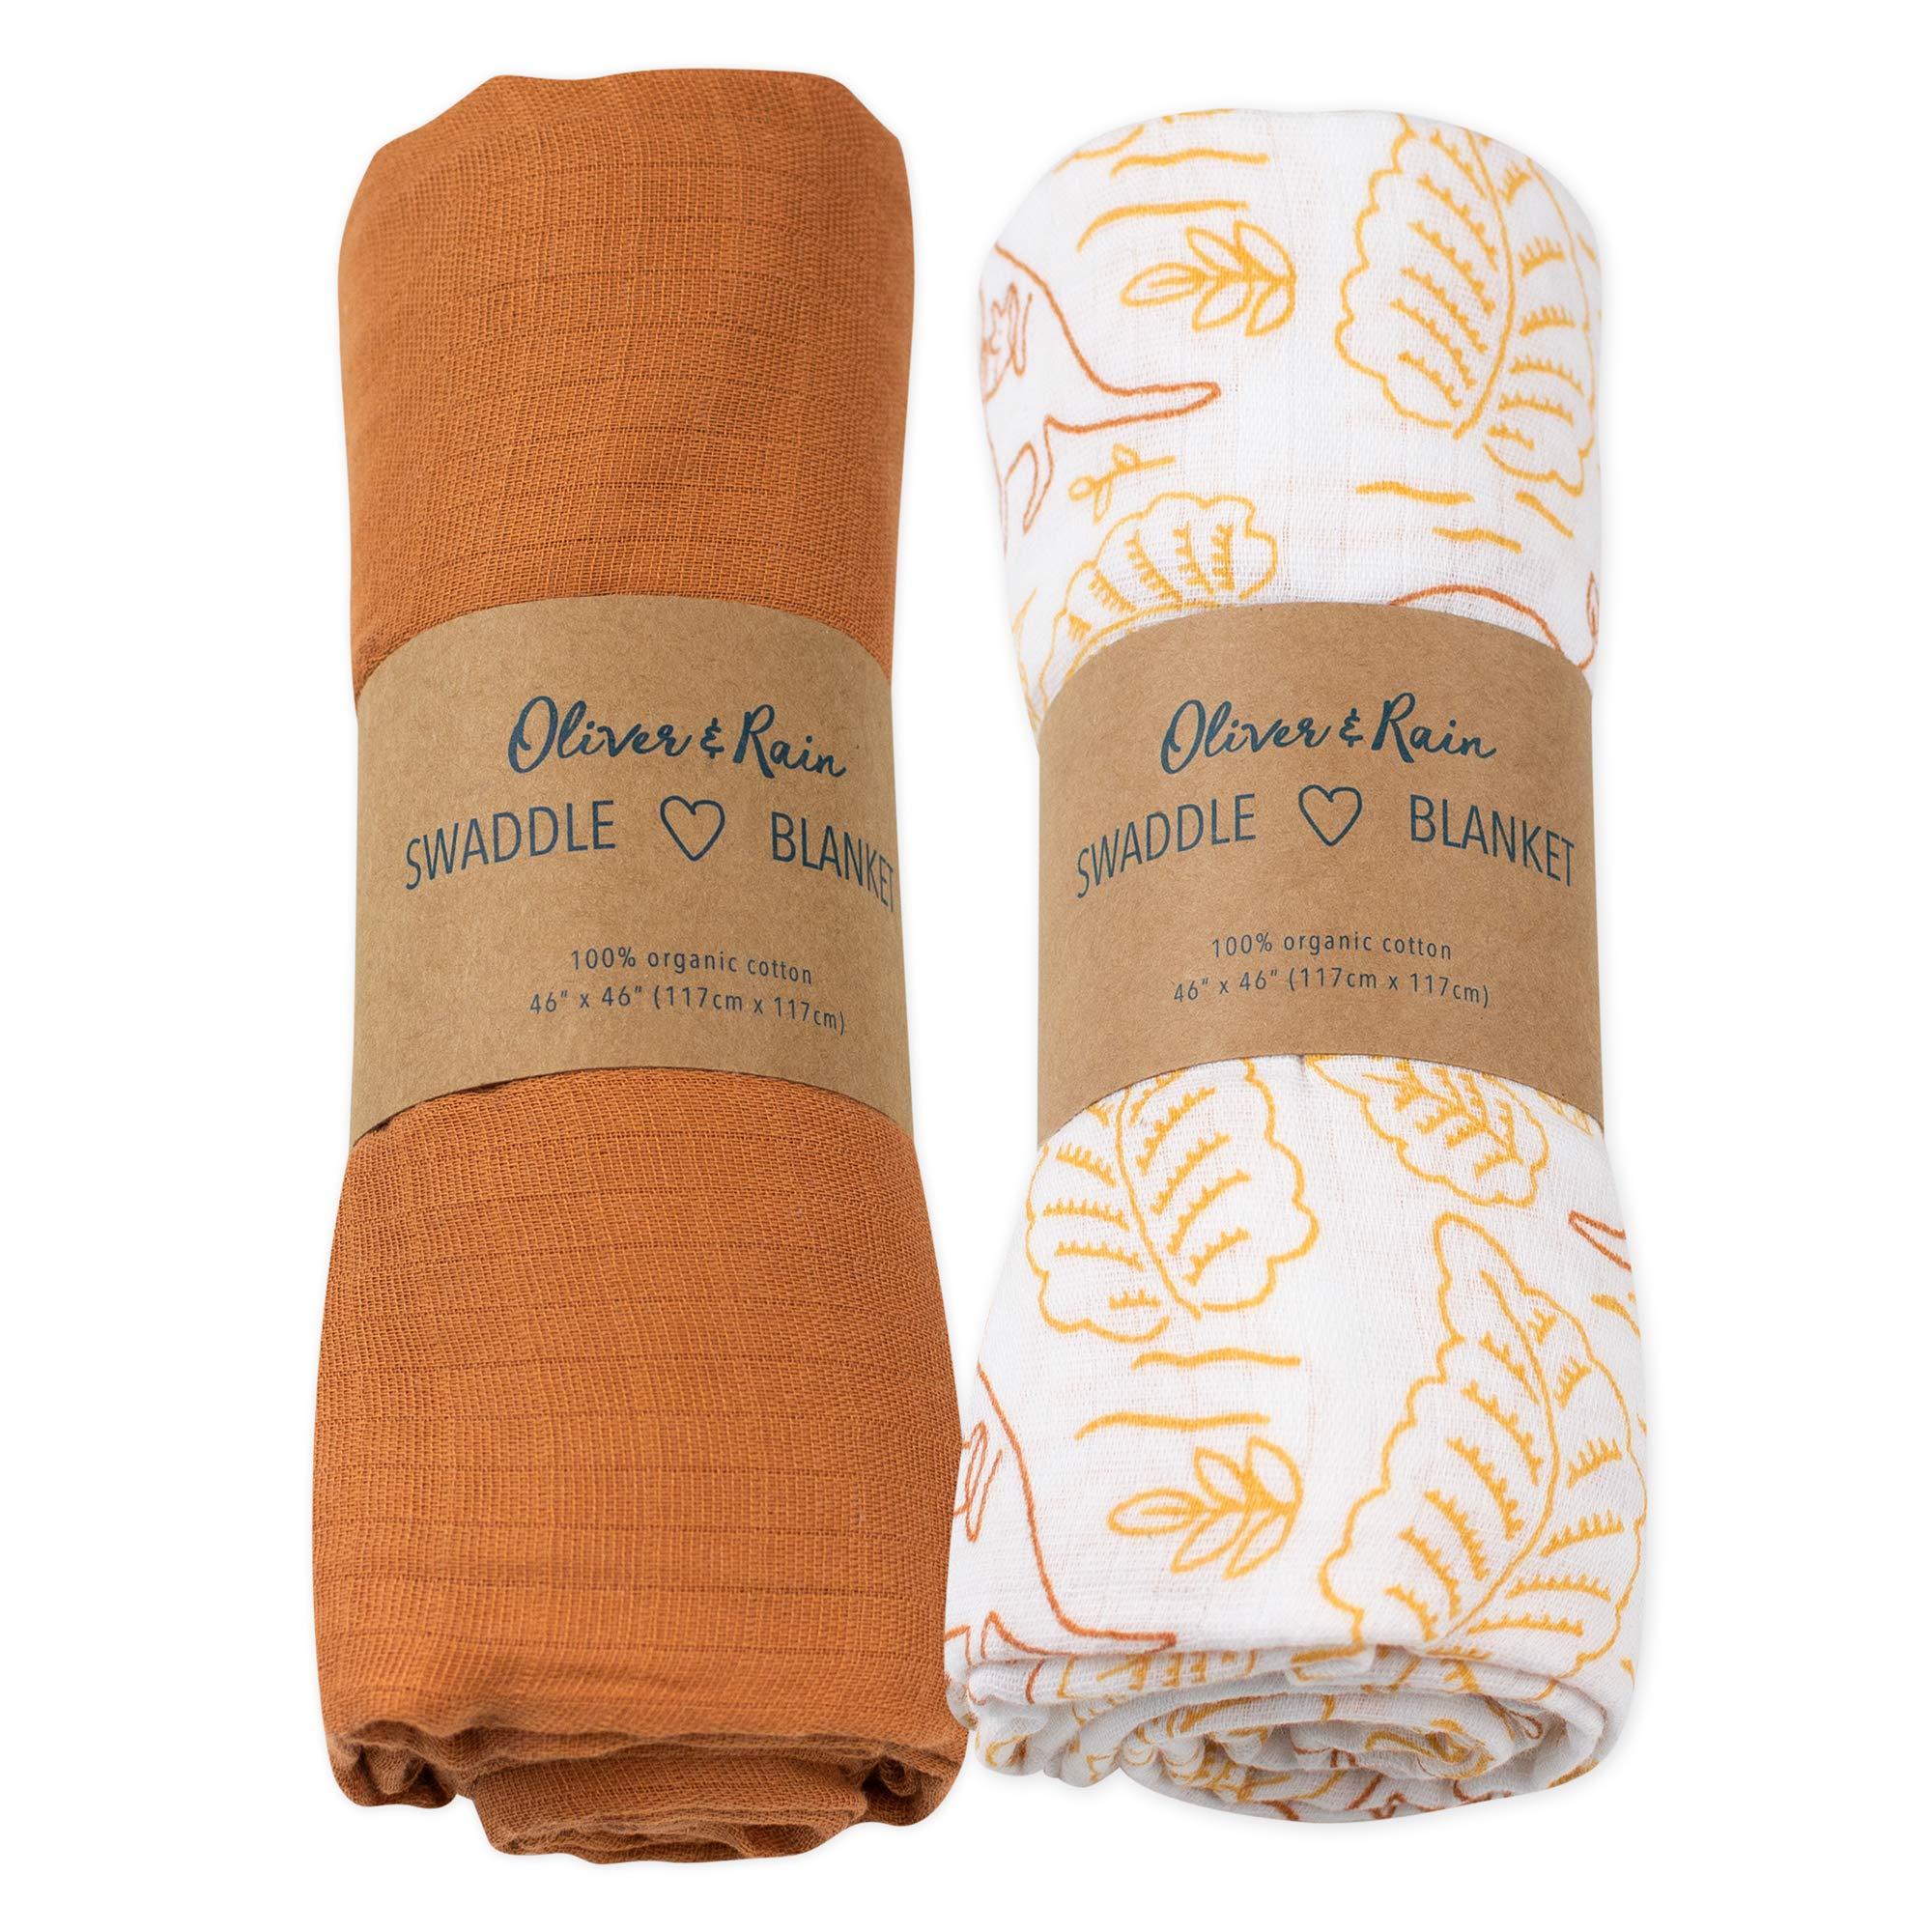 Oliver & Rain Girl Organic Muslin Swaddle Baby Blanket, Kangaroo Leaf Print and Solid Sunset Brown